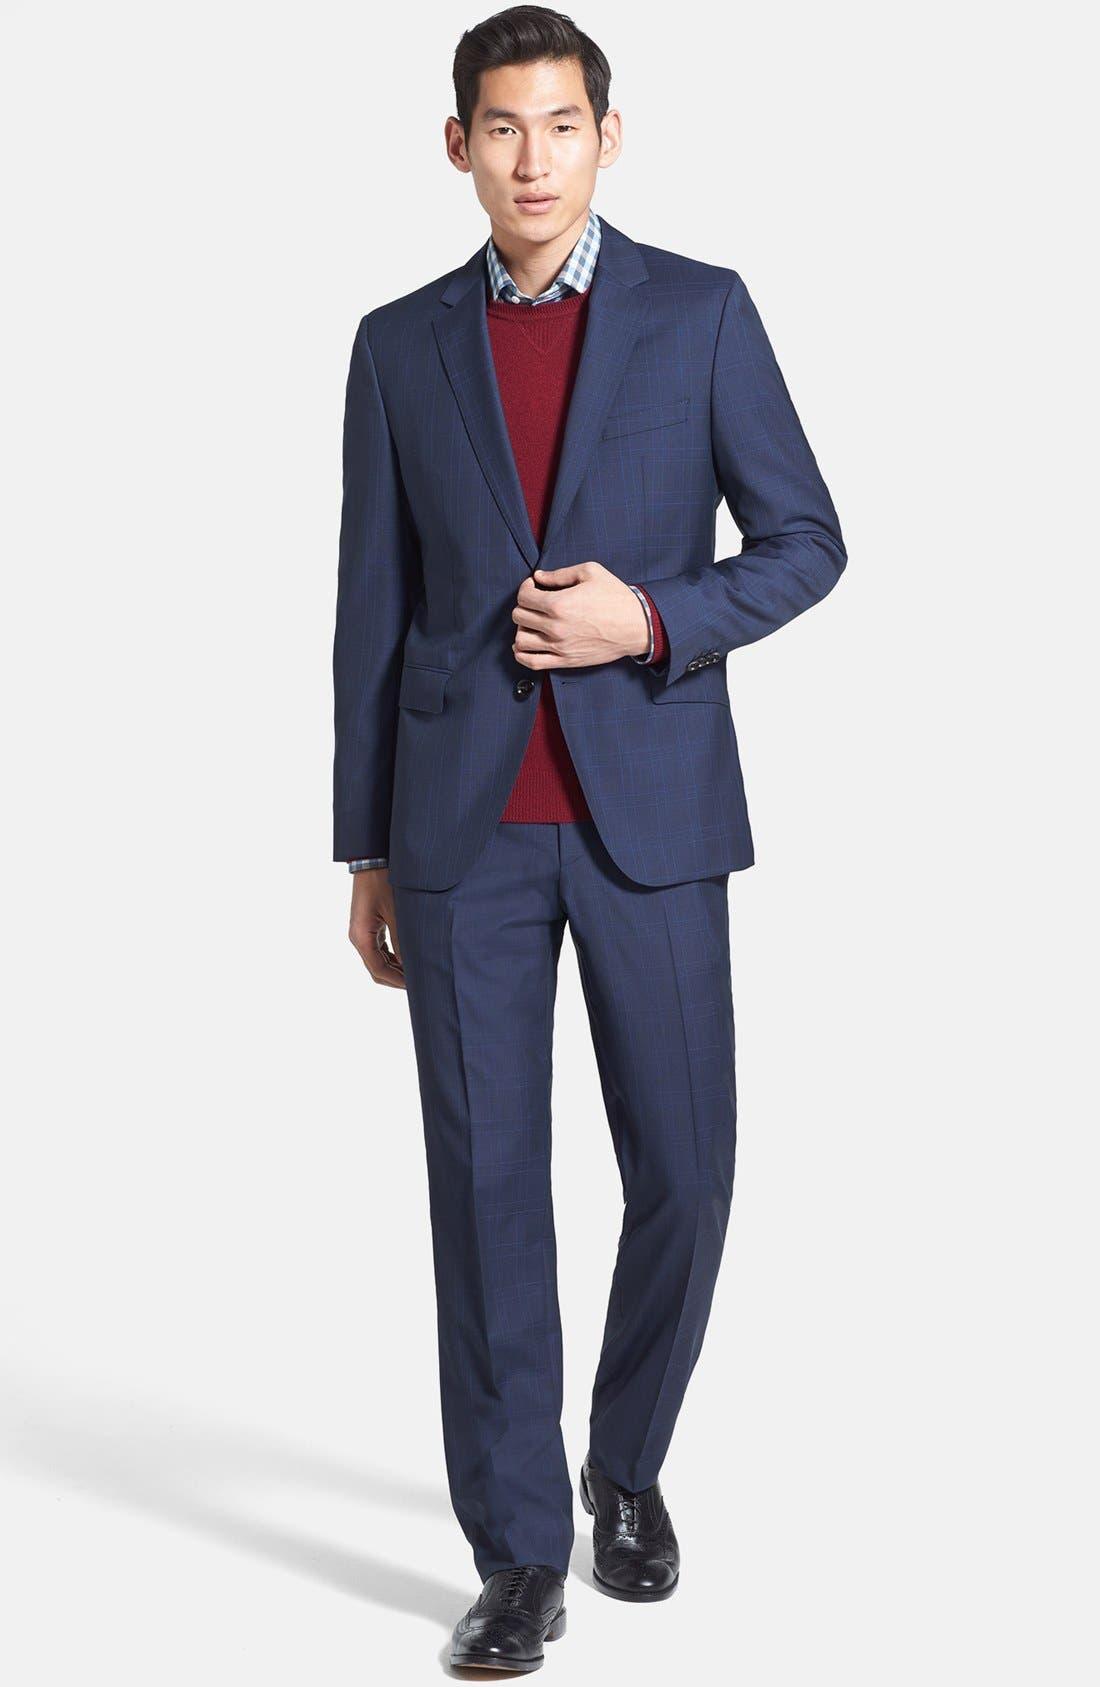 Main Image - BOSS HUGO BOSS 'James/Sharp' Trim Fit Windowpane Suit